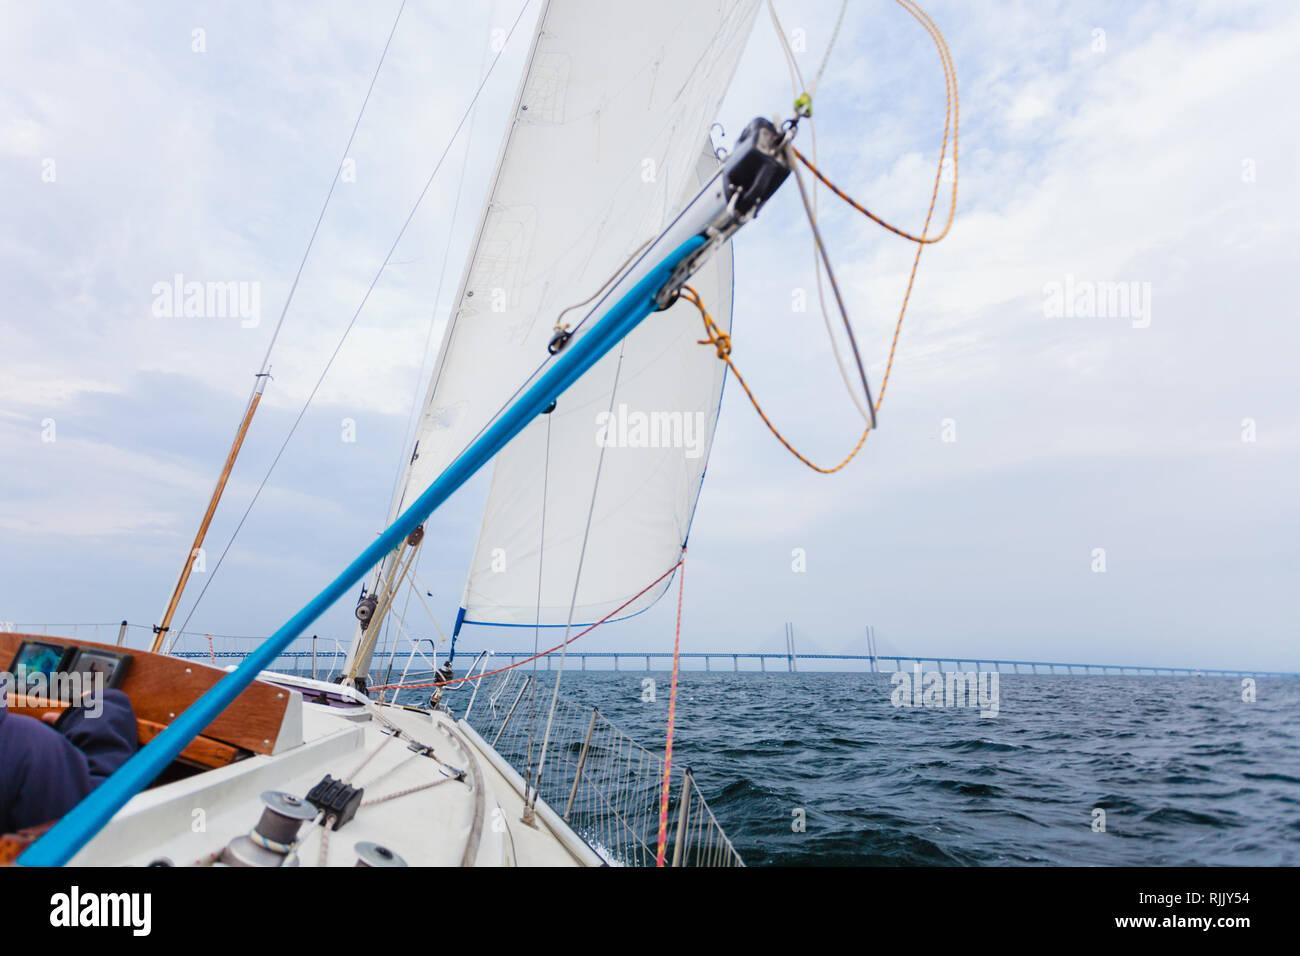 Oresundsbron. The Oresund bridge link between Denmark and Sweden, Europe, Baltic Sea. View from sailboat yacht. Overcast sky. Landmark and travel. Stock Photo